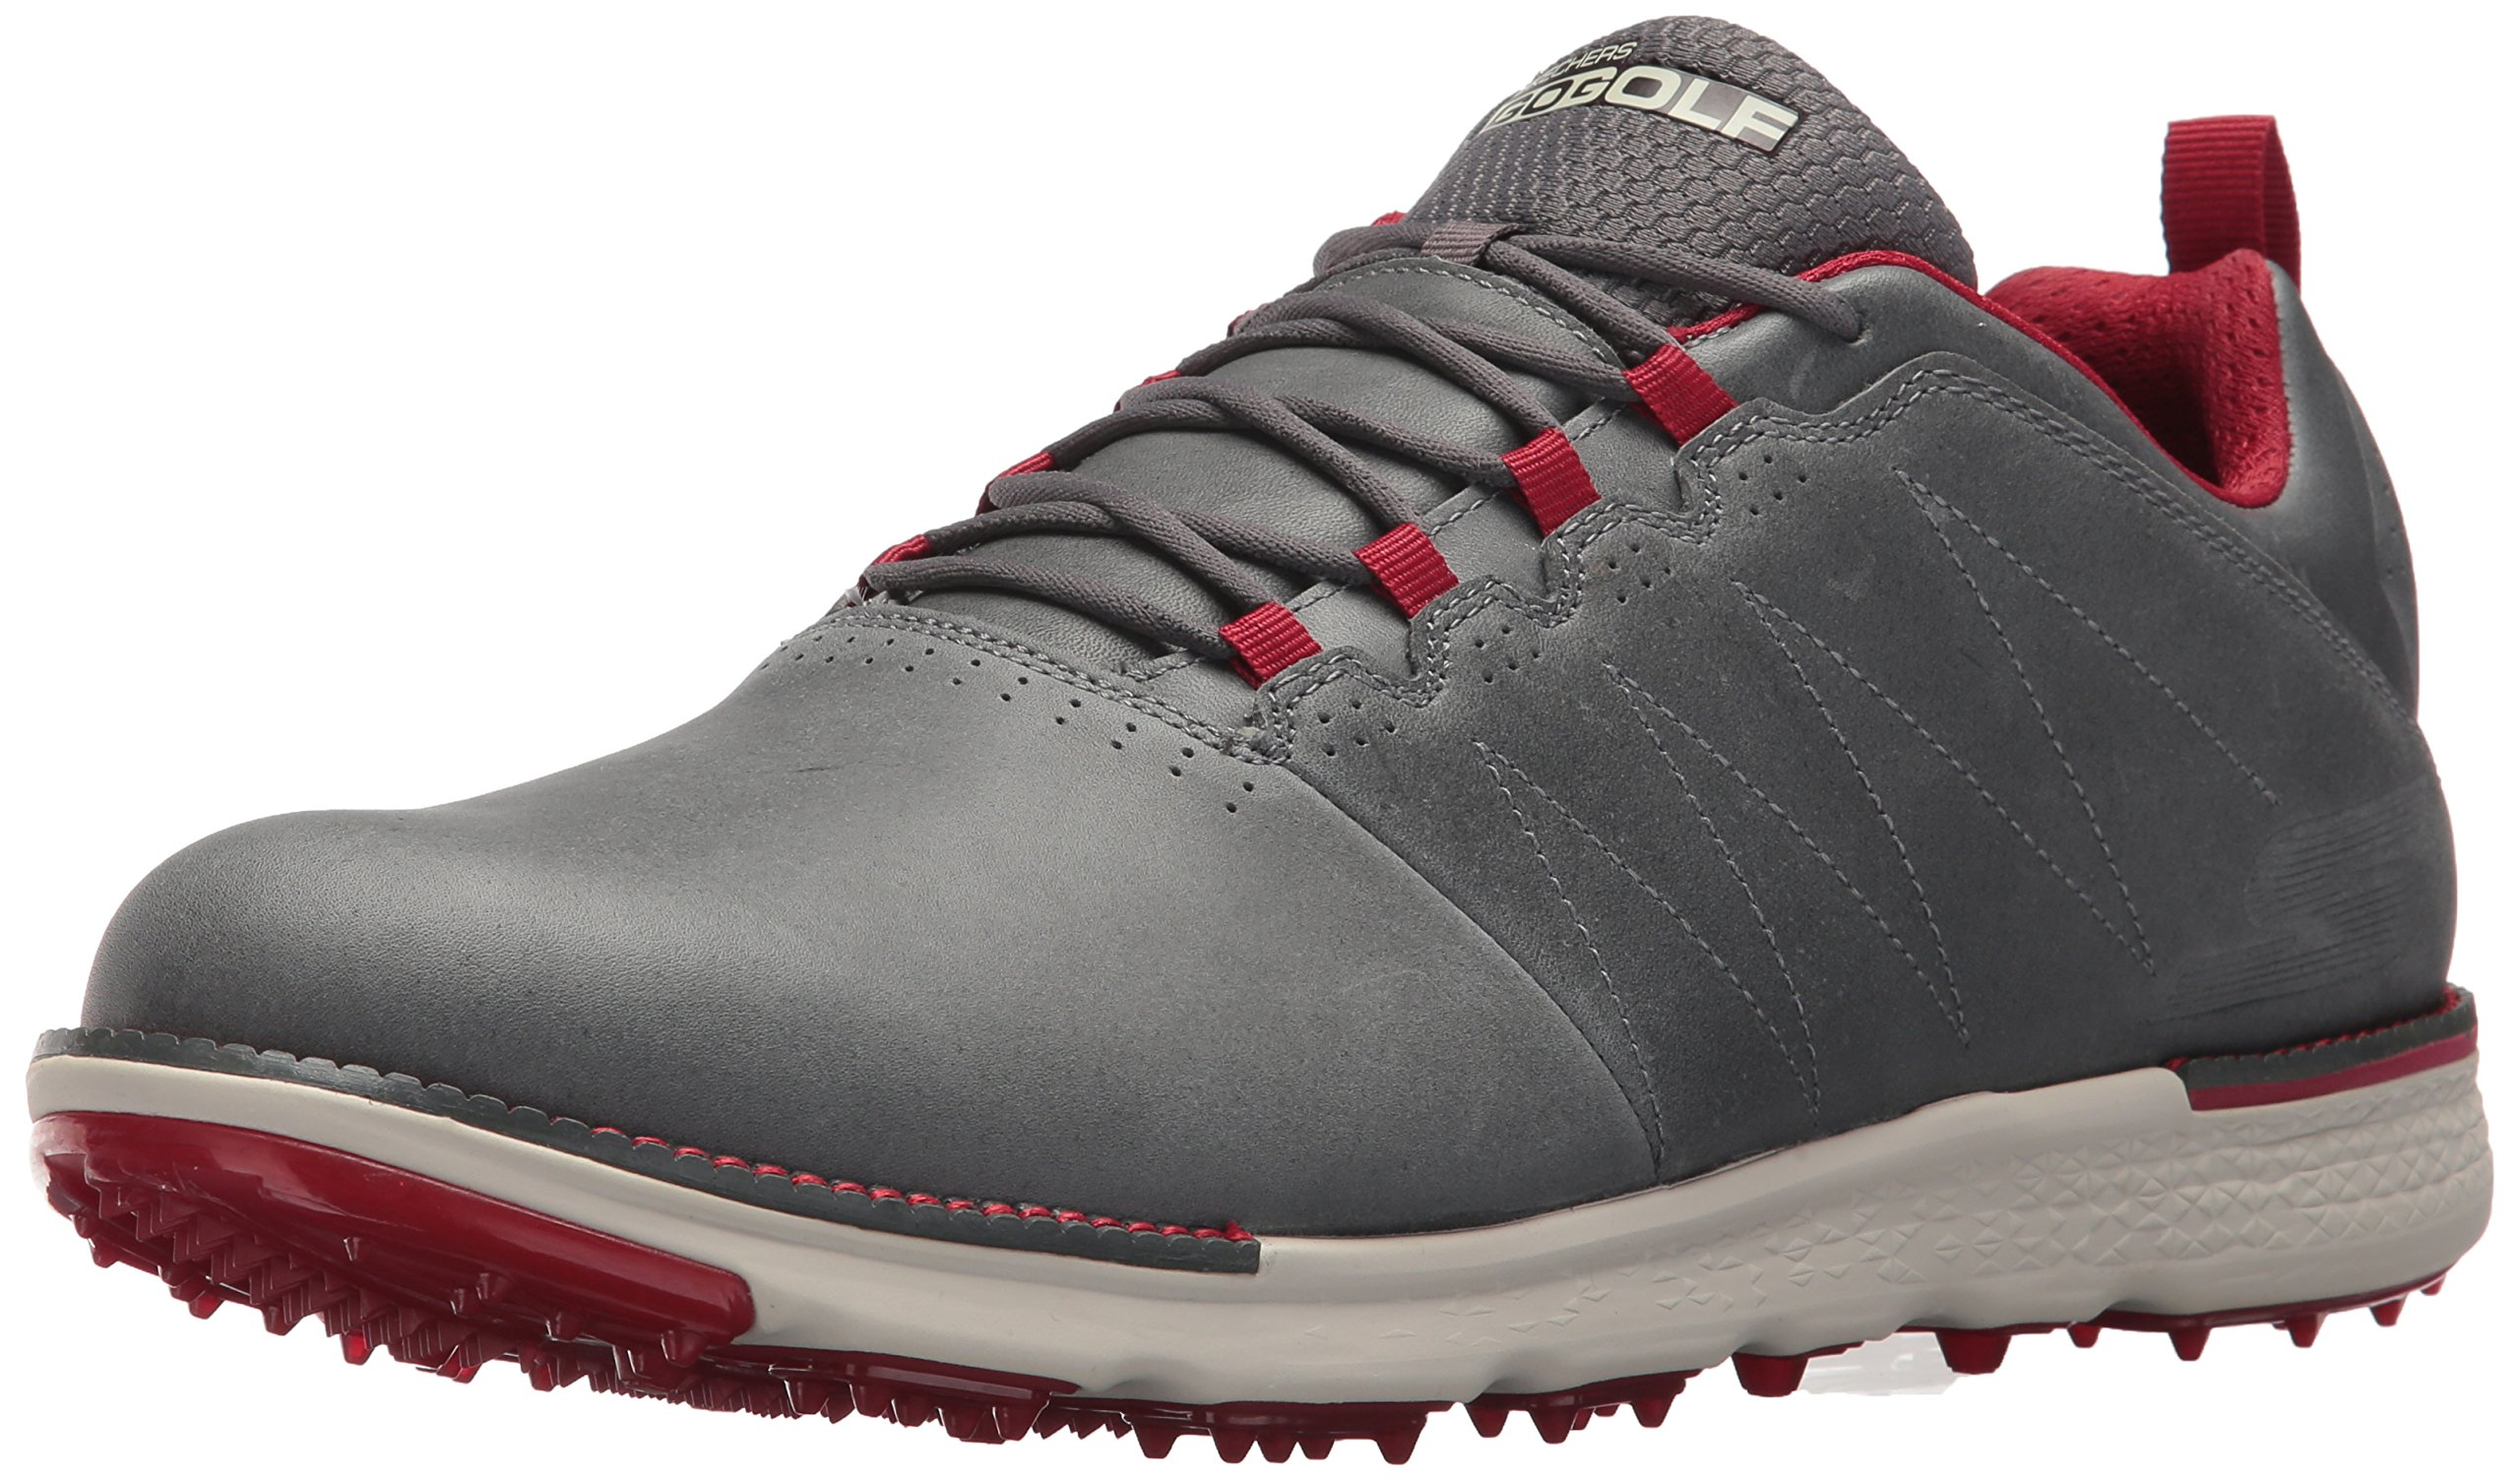 Skechers Men's Go Golf Elite 3 Lx Golf Shoe,Charcoal/Red,7.5 M US